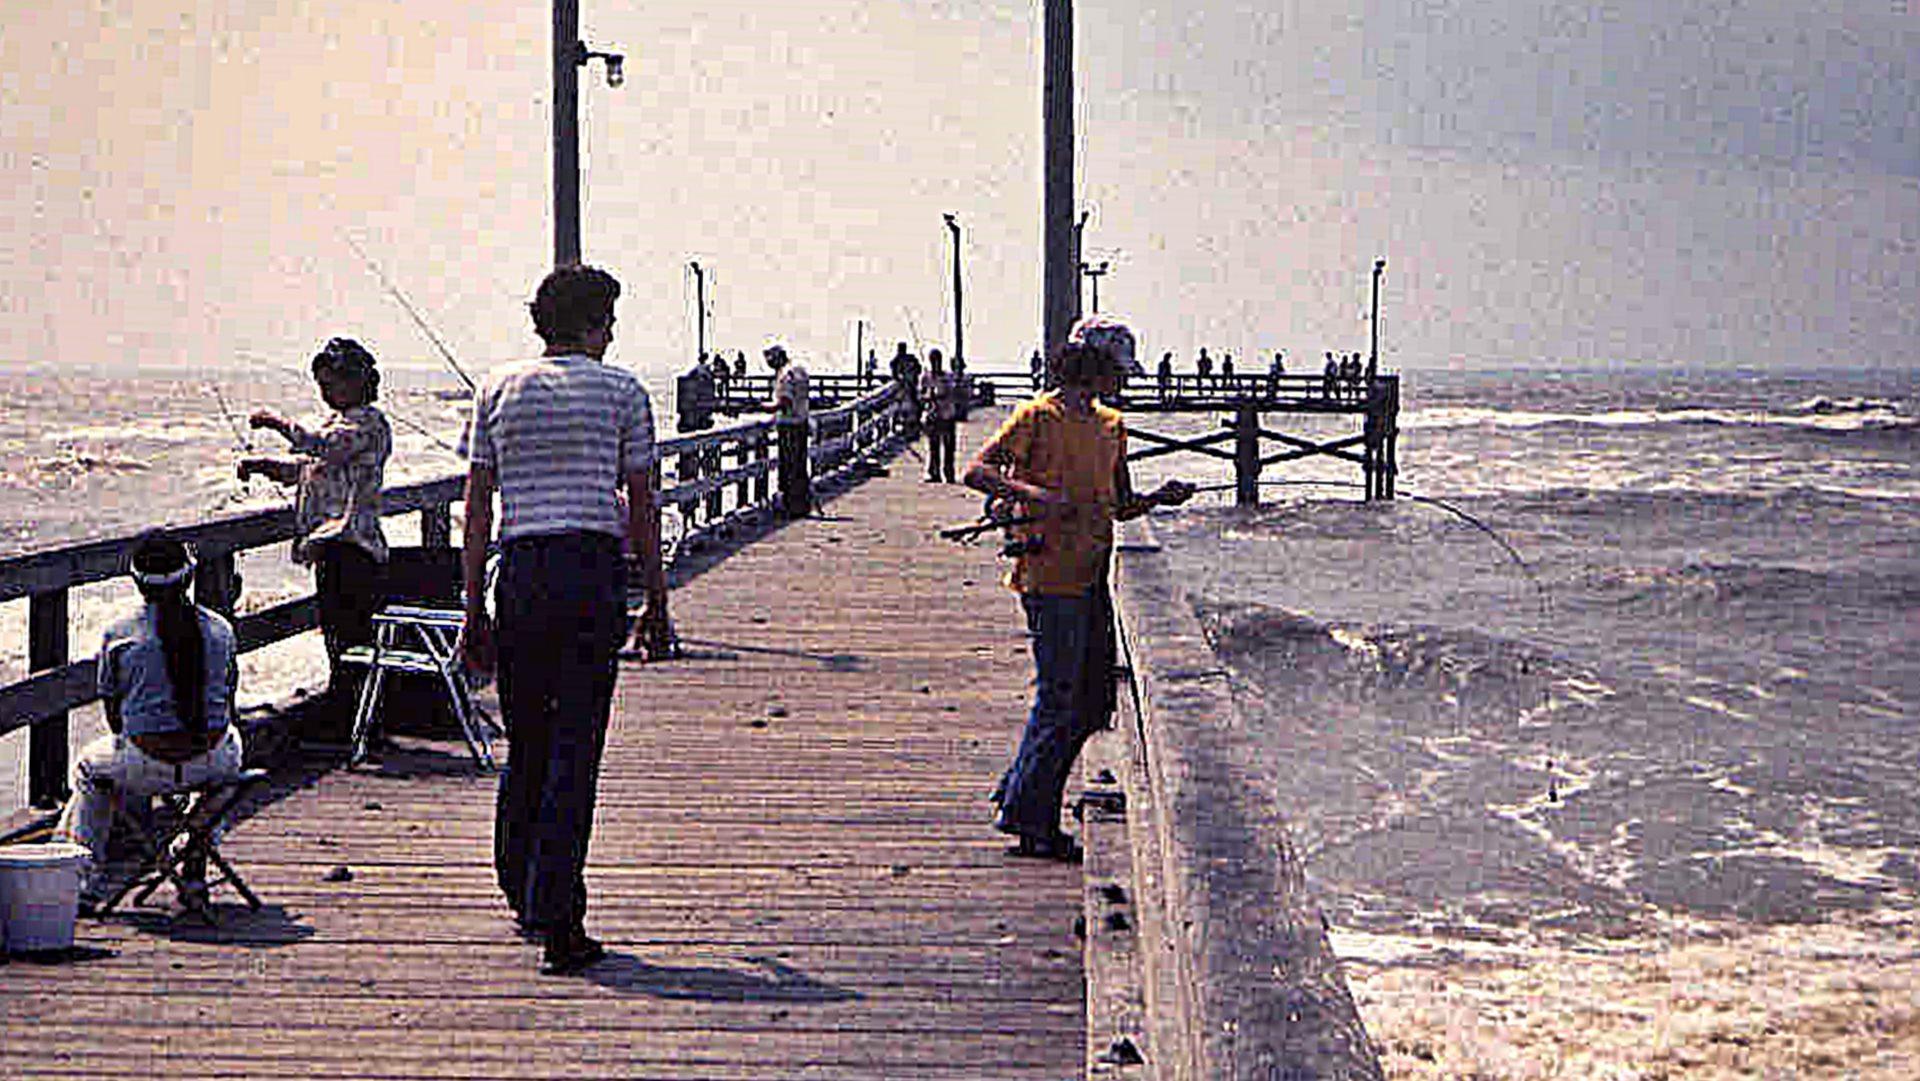 Corpus christi for Corpus christi fishing spots